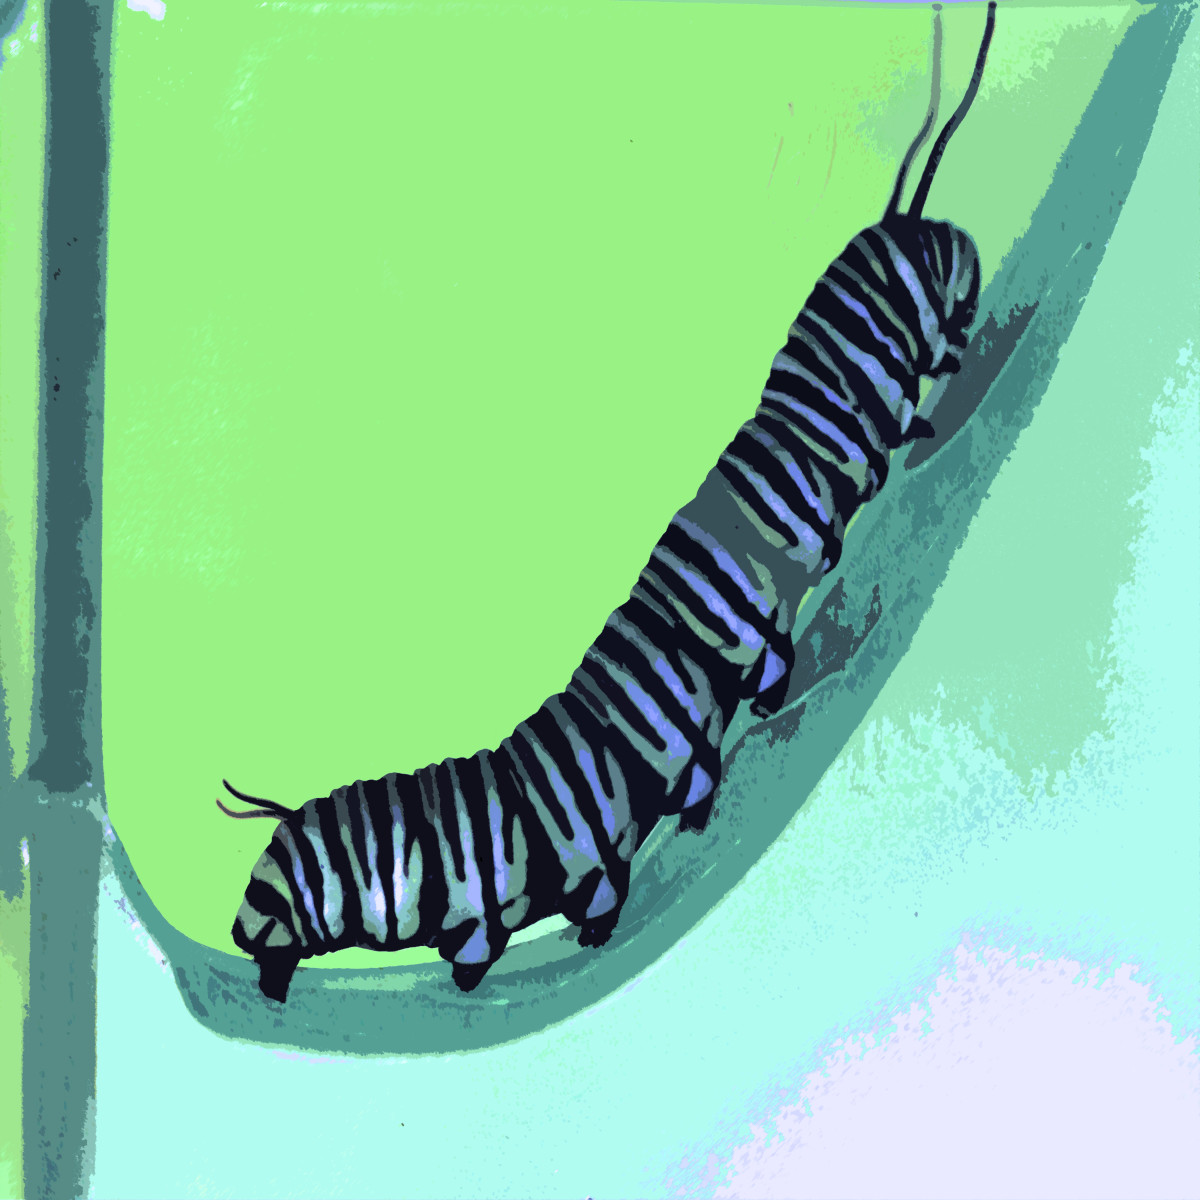 Caterpillar by Gina Godfrey